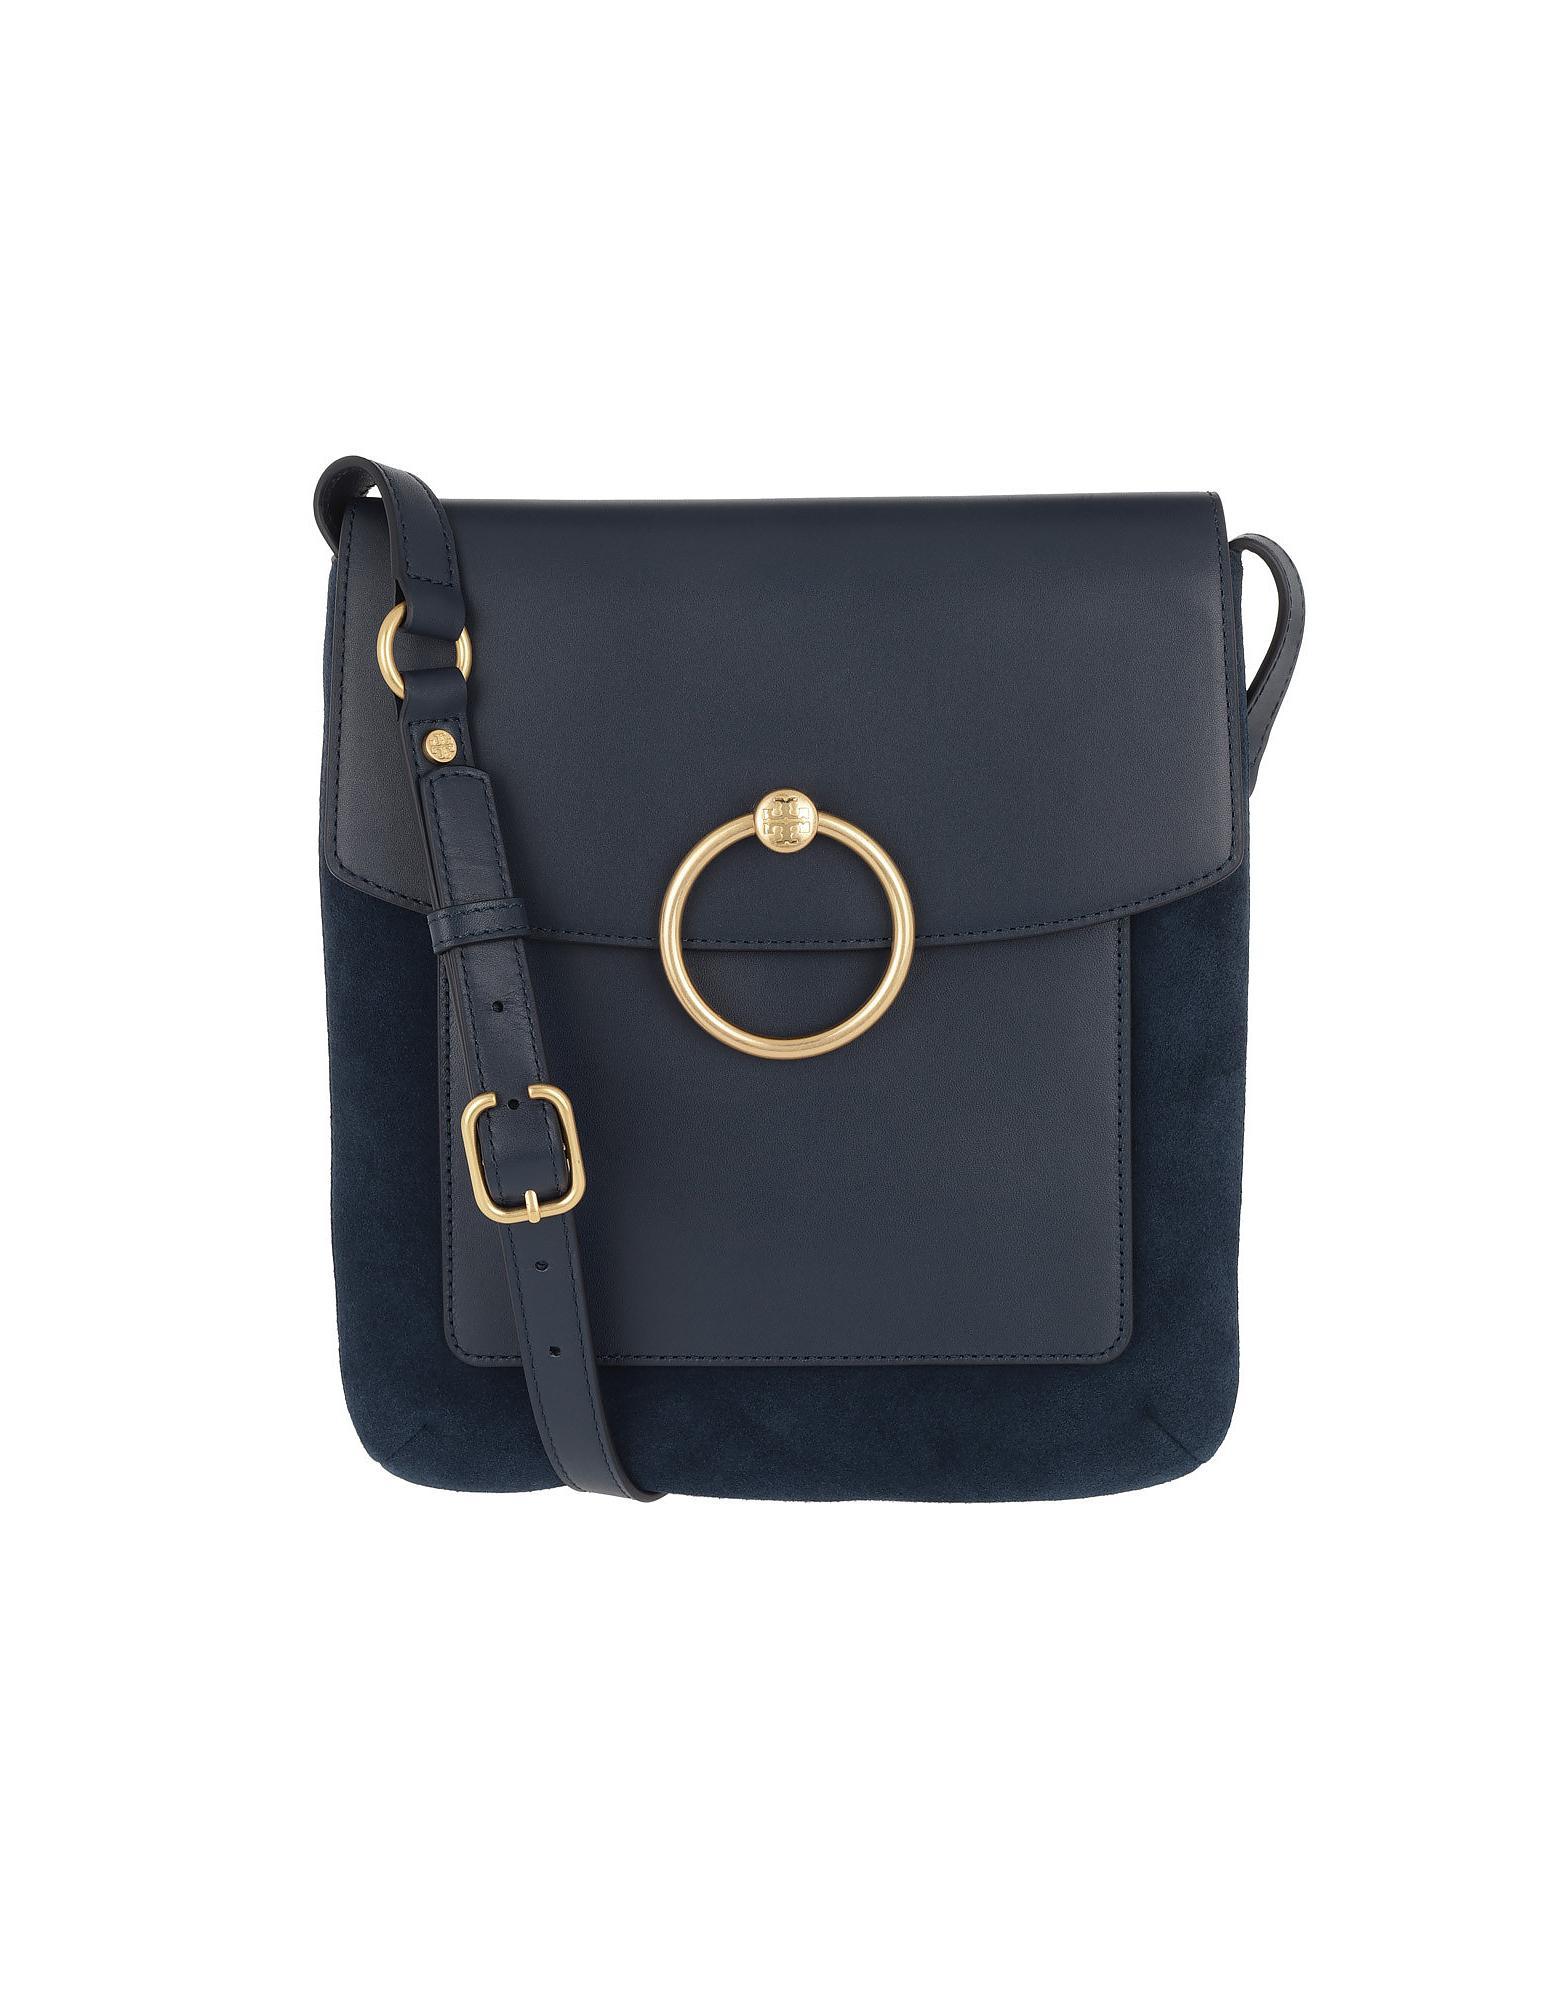 525a5b798ff87d Tory Burch Farrah Shoulder Bag Royal Navy in Blue - Lyst